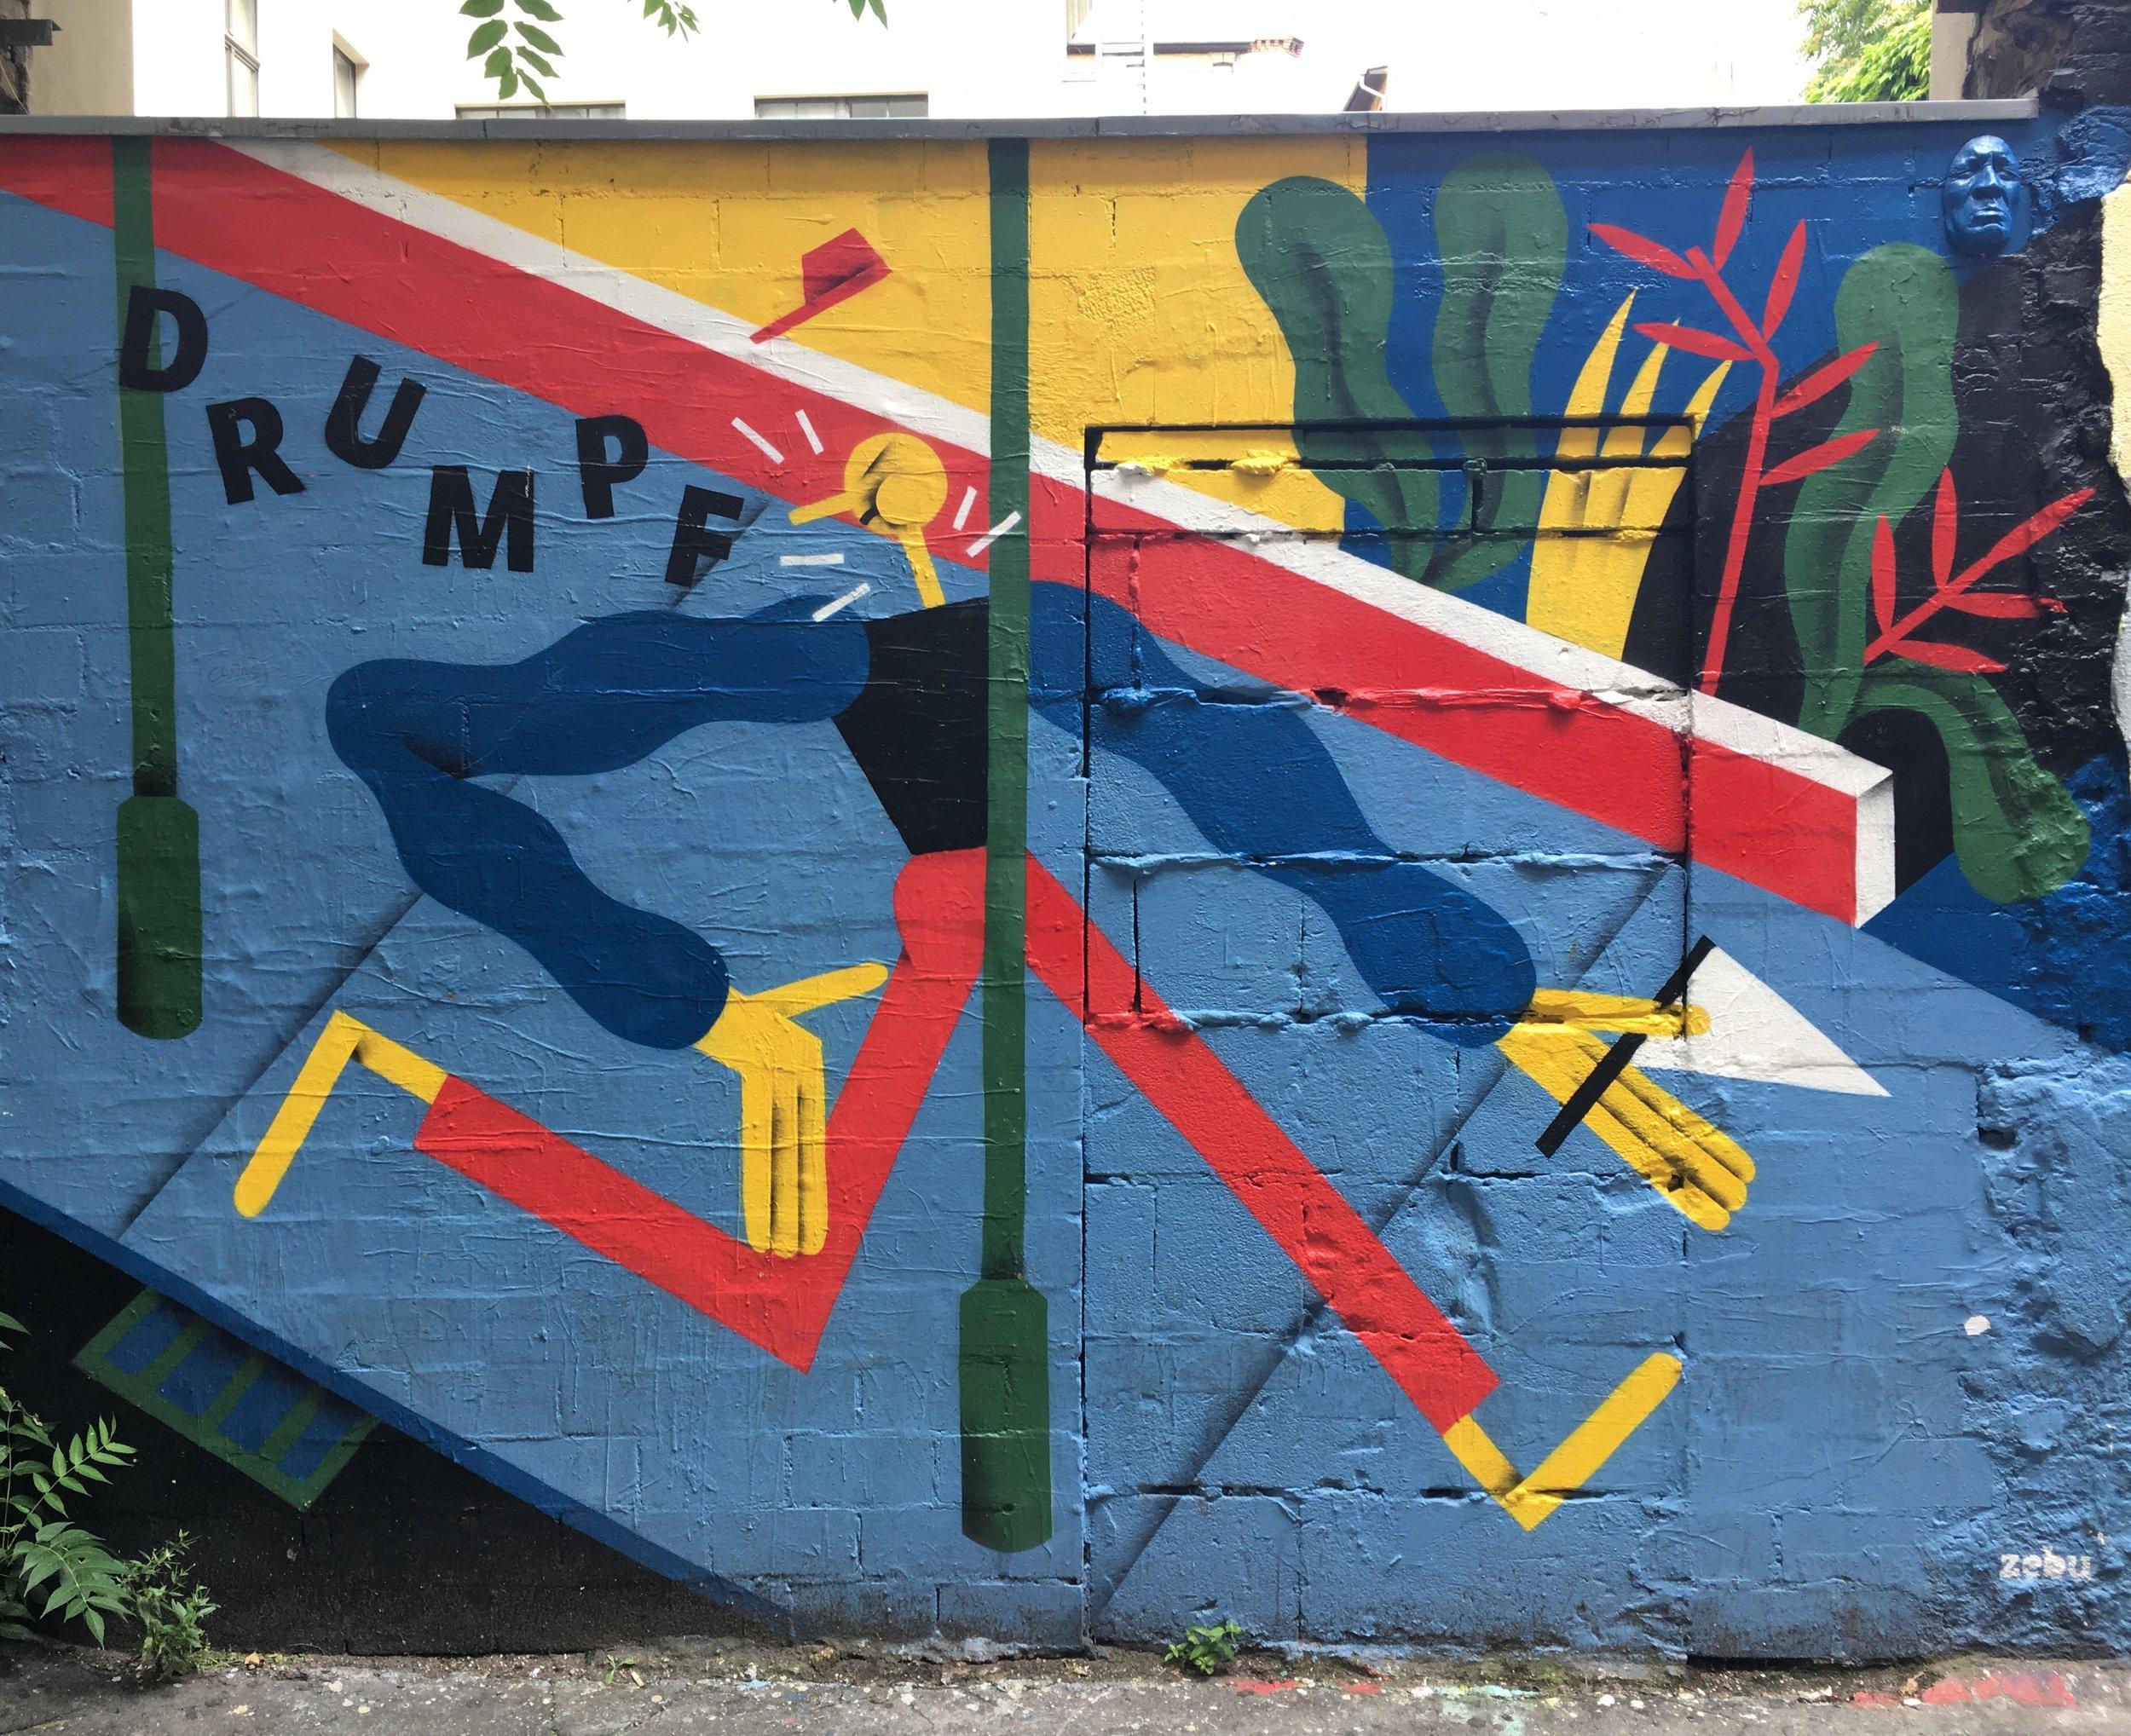 Hackesche-Hoefe-Street-Art-Drumpf-Berlin